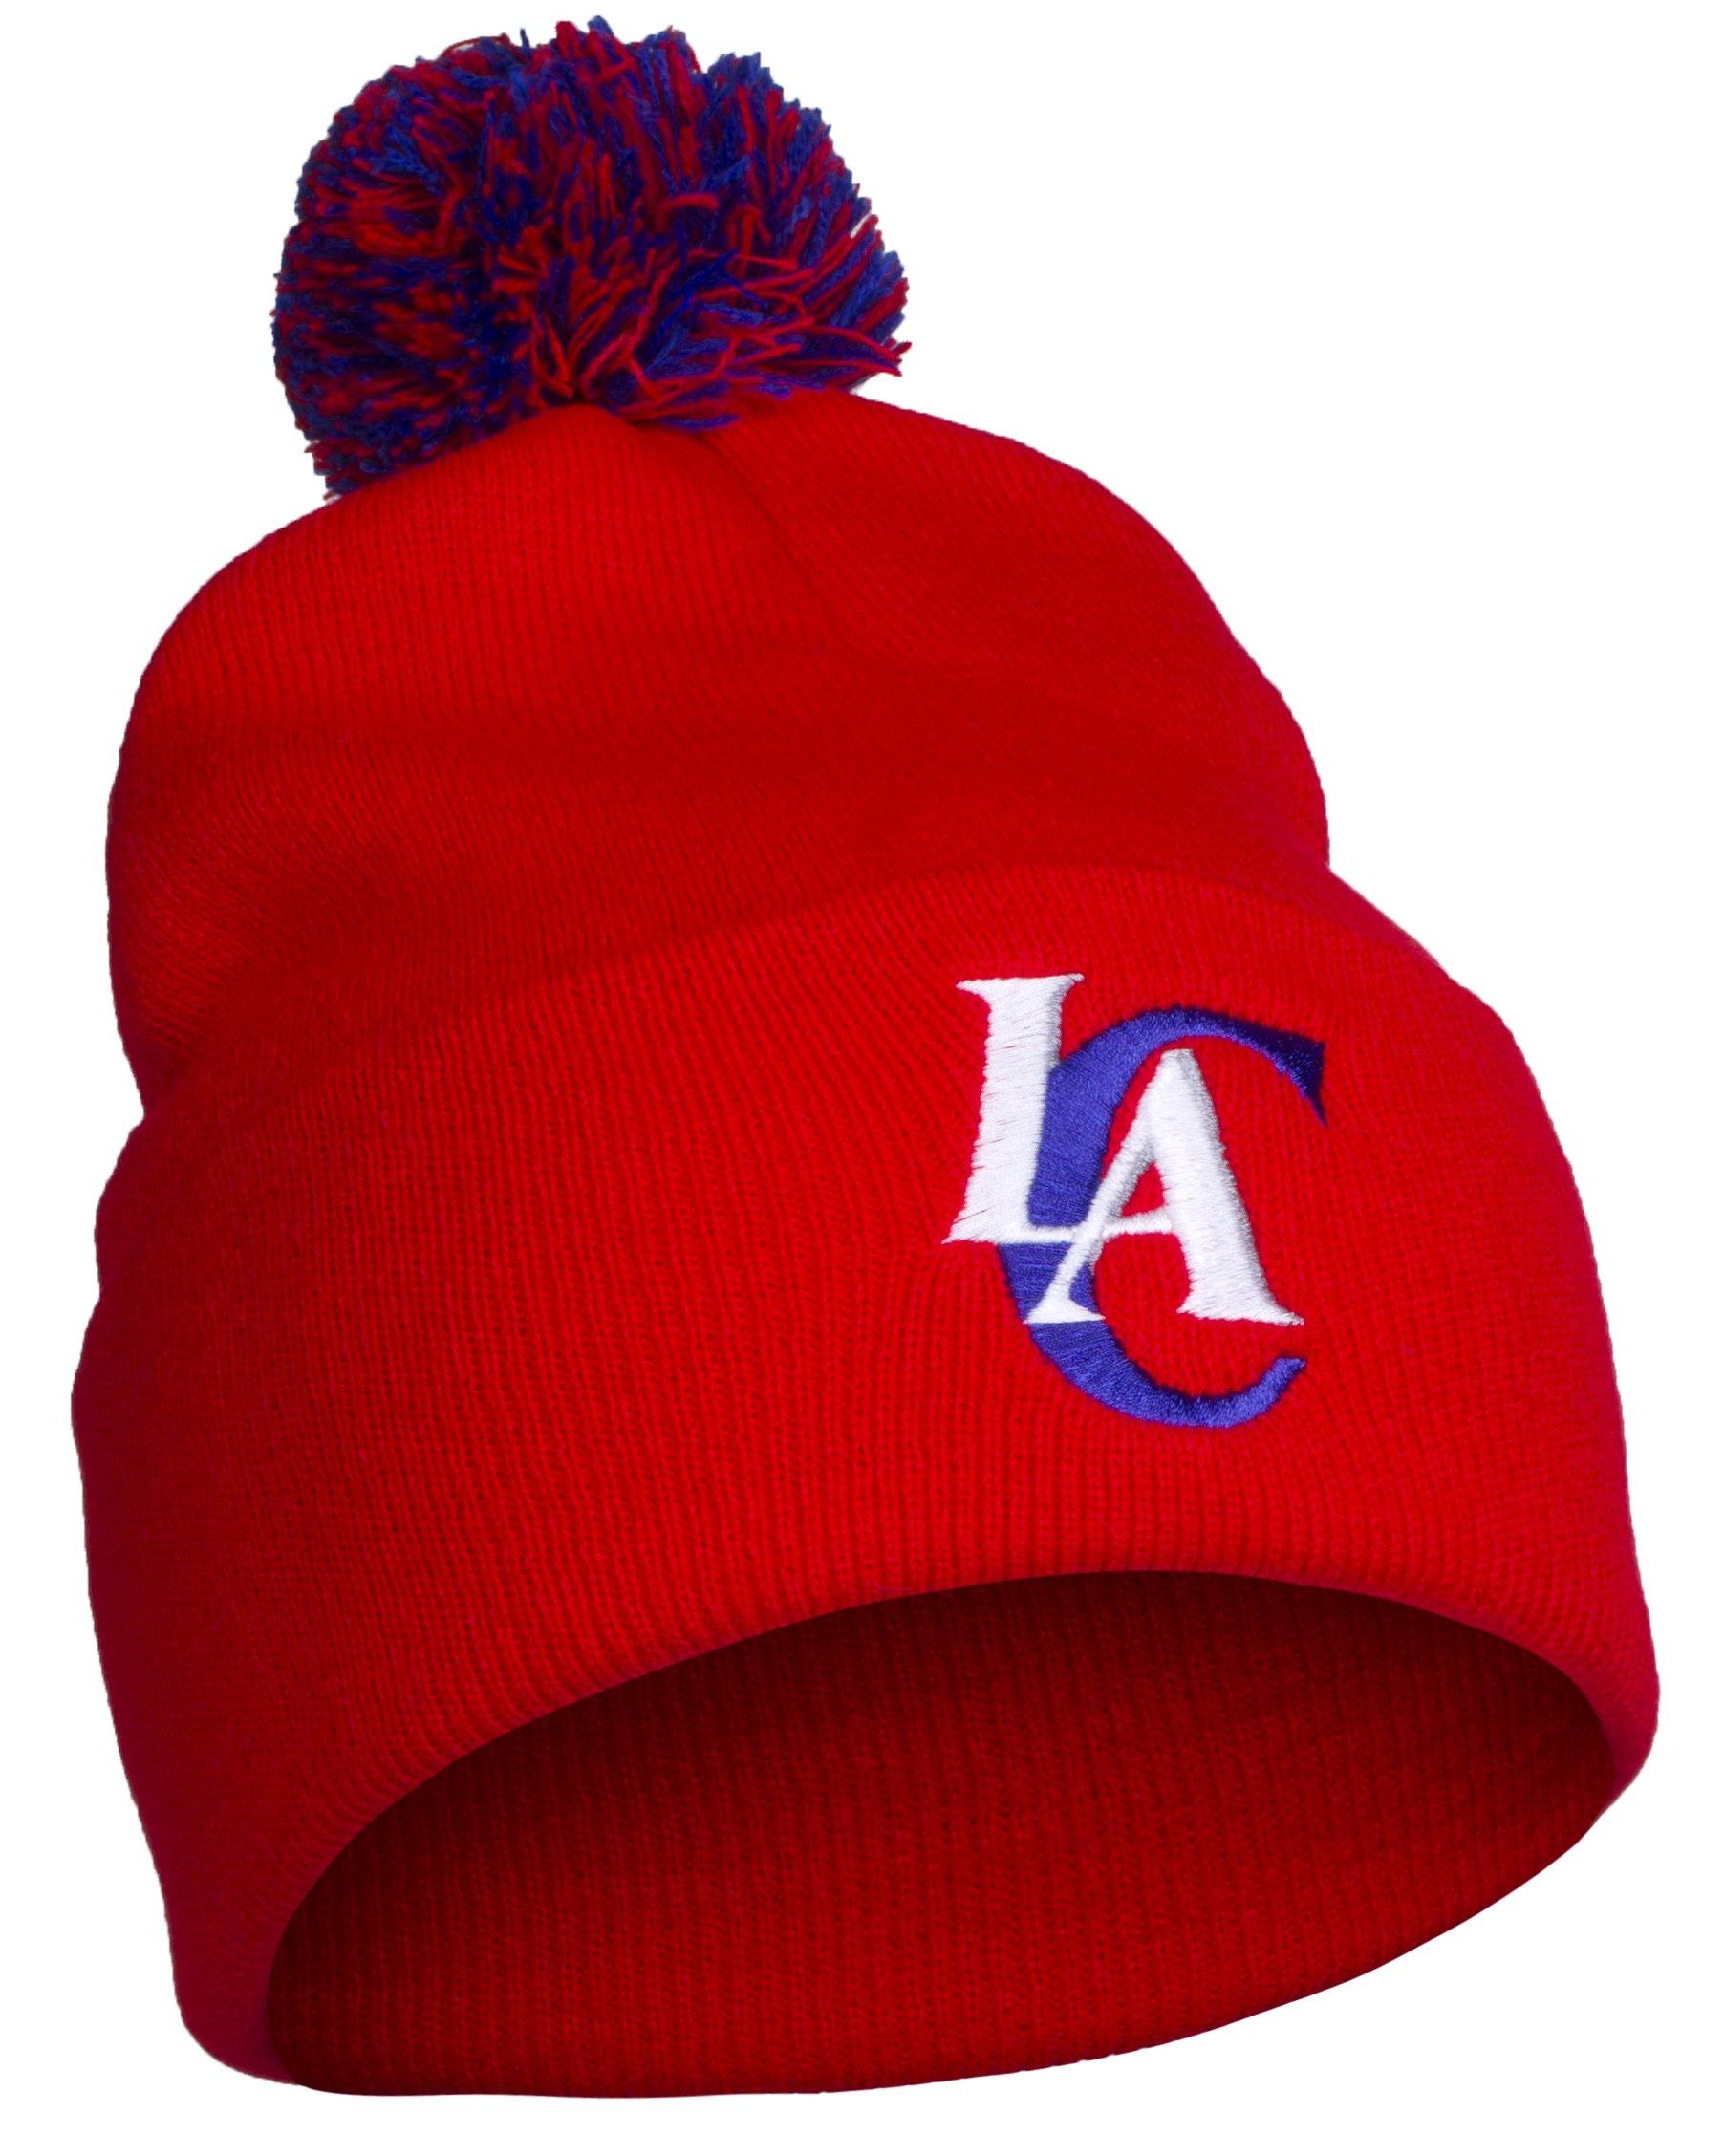 NBA Los Angeles LA Clippers Cuff Pom Pom Beanie Knit Hat Cap by NBA